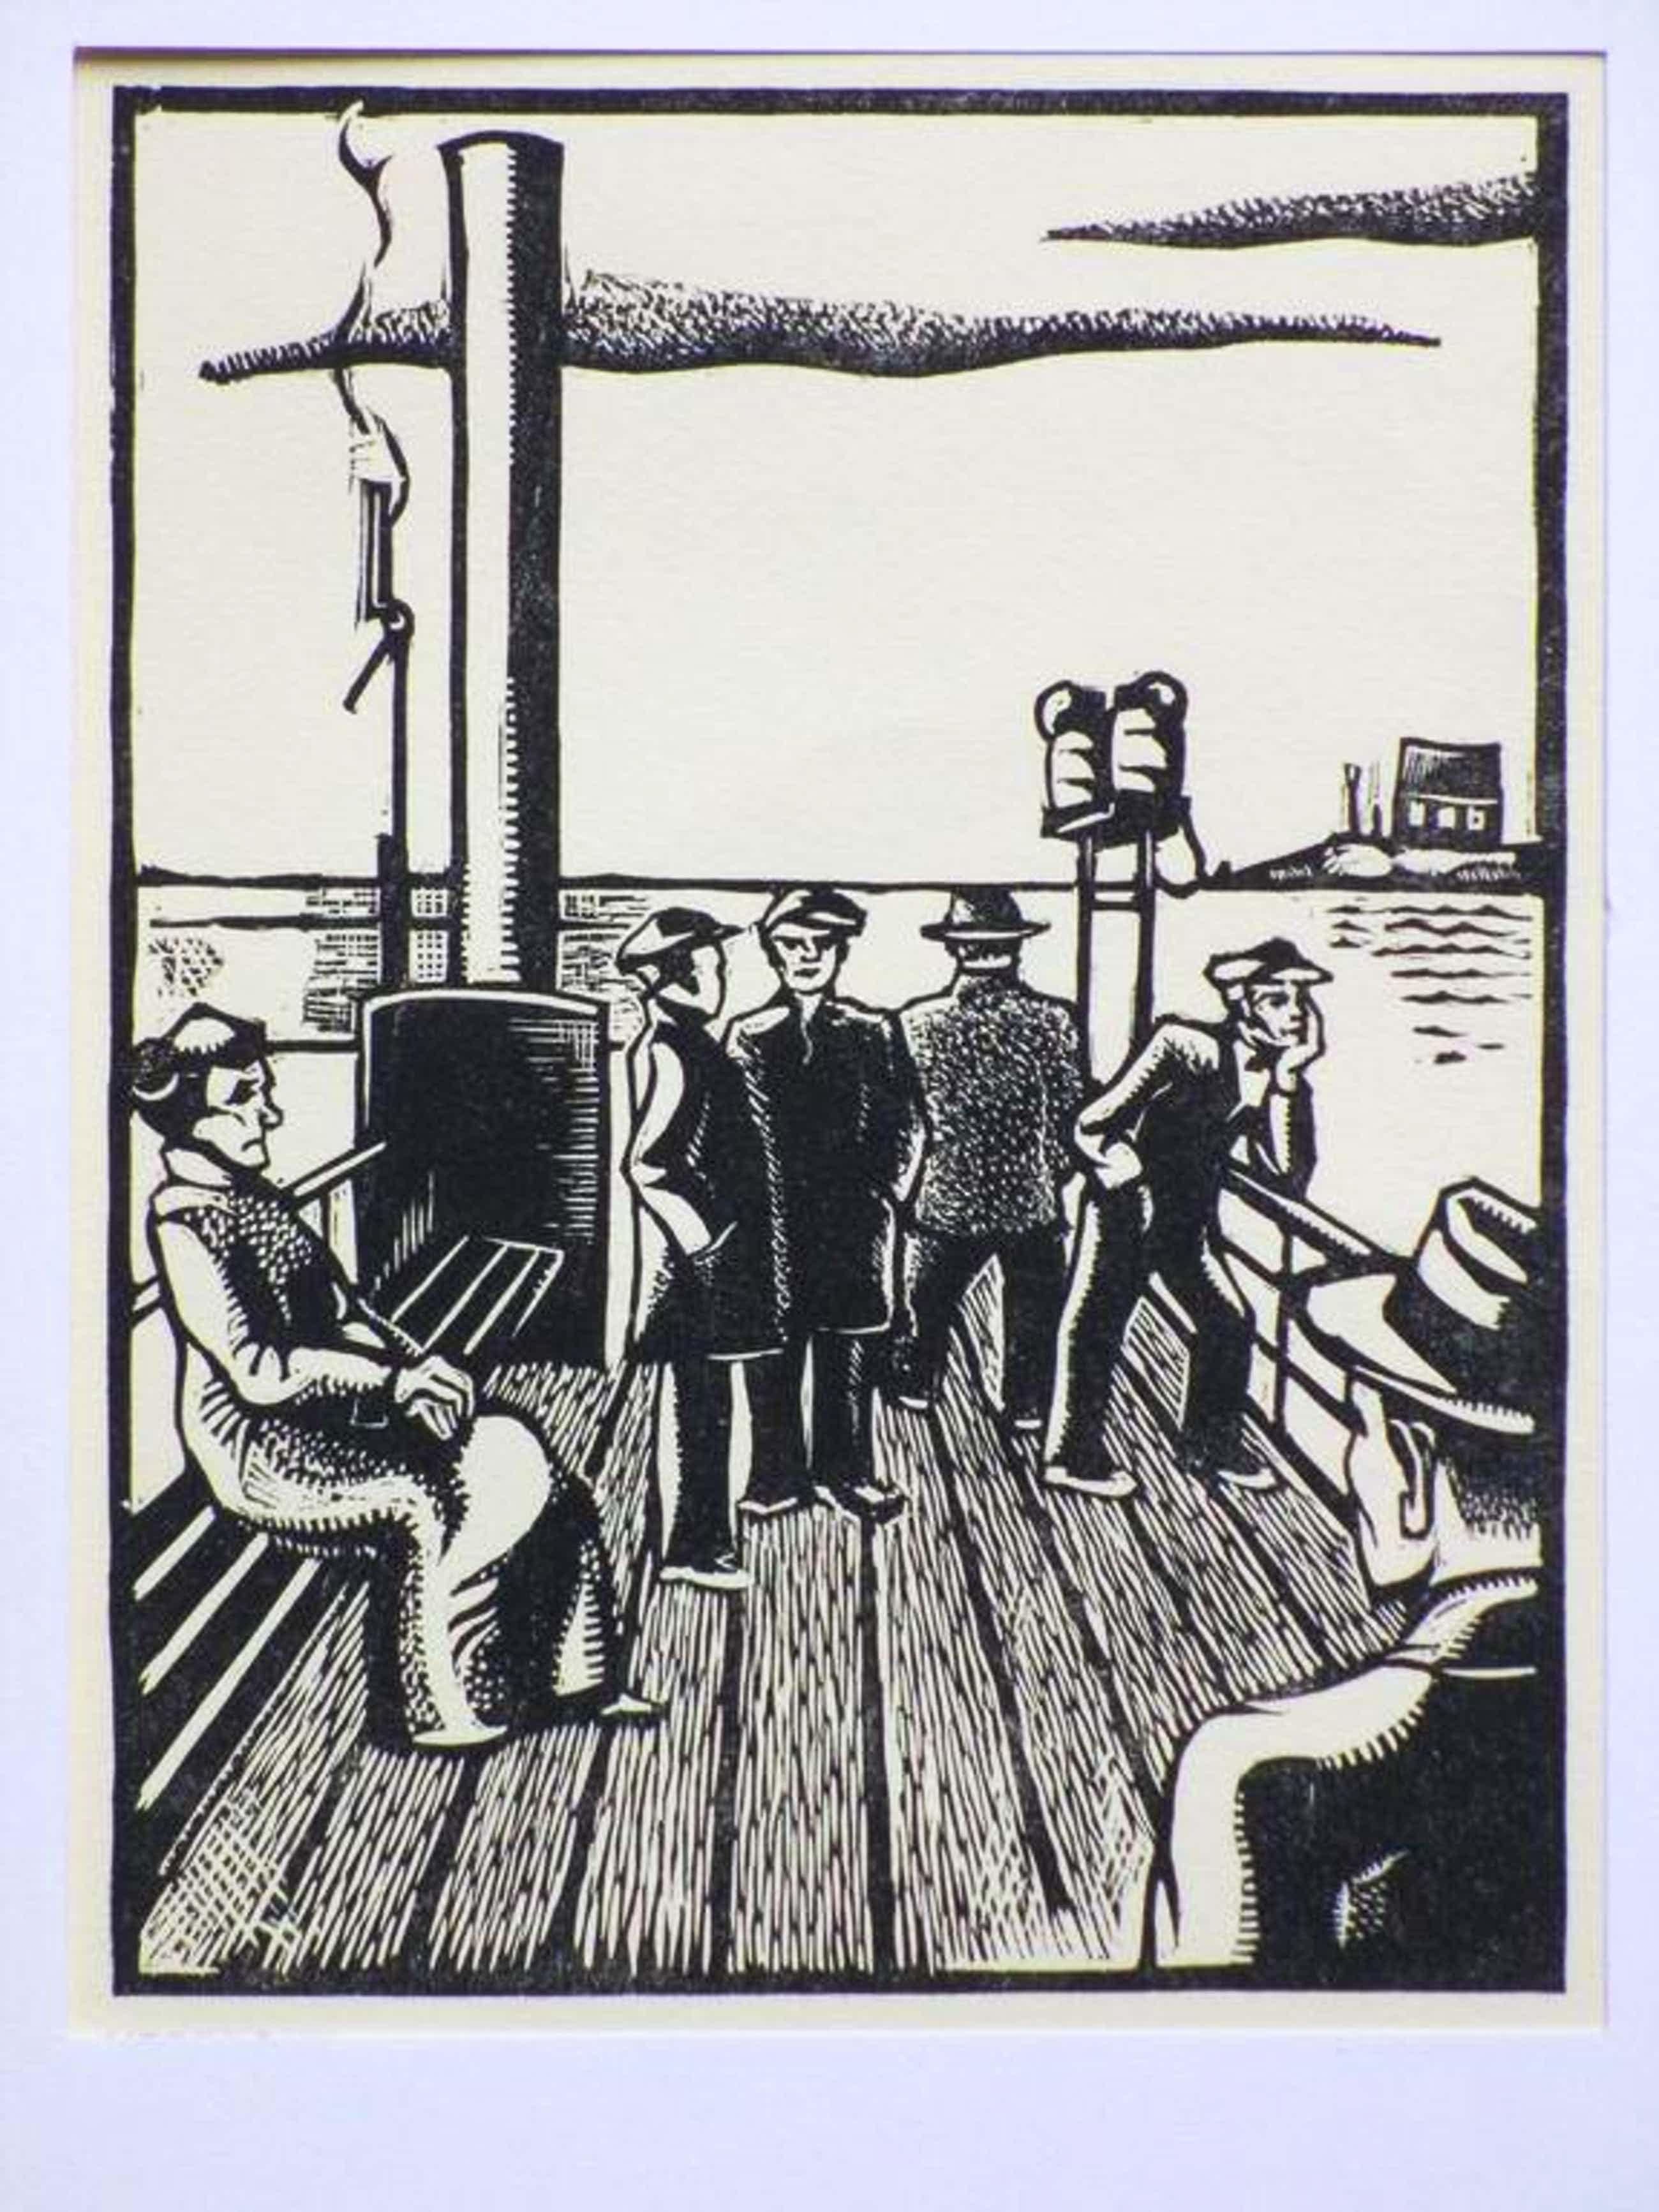 Wim Oepts, Veerpont, Houtsnede 1927 kopen? Bied vanaf 35!